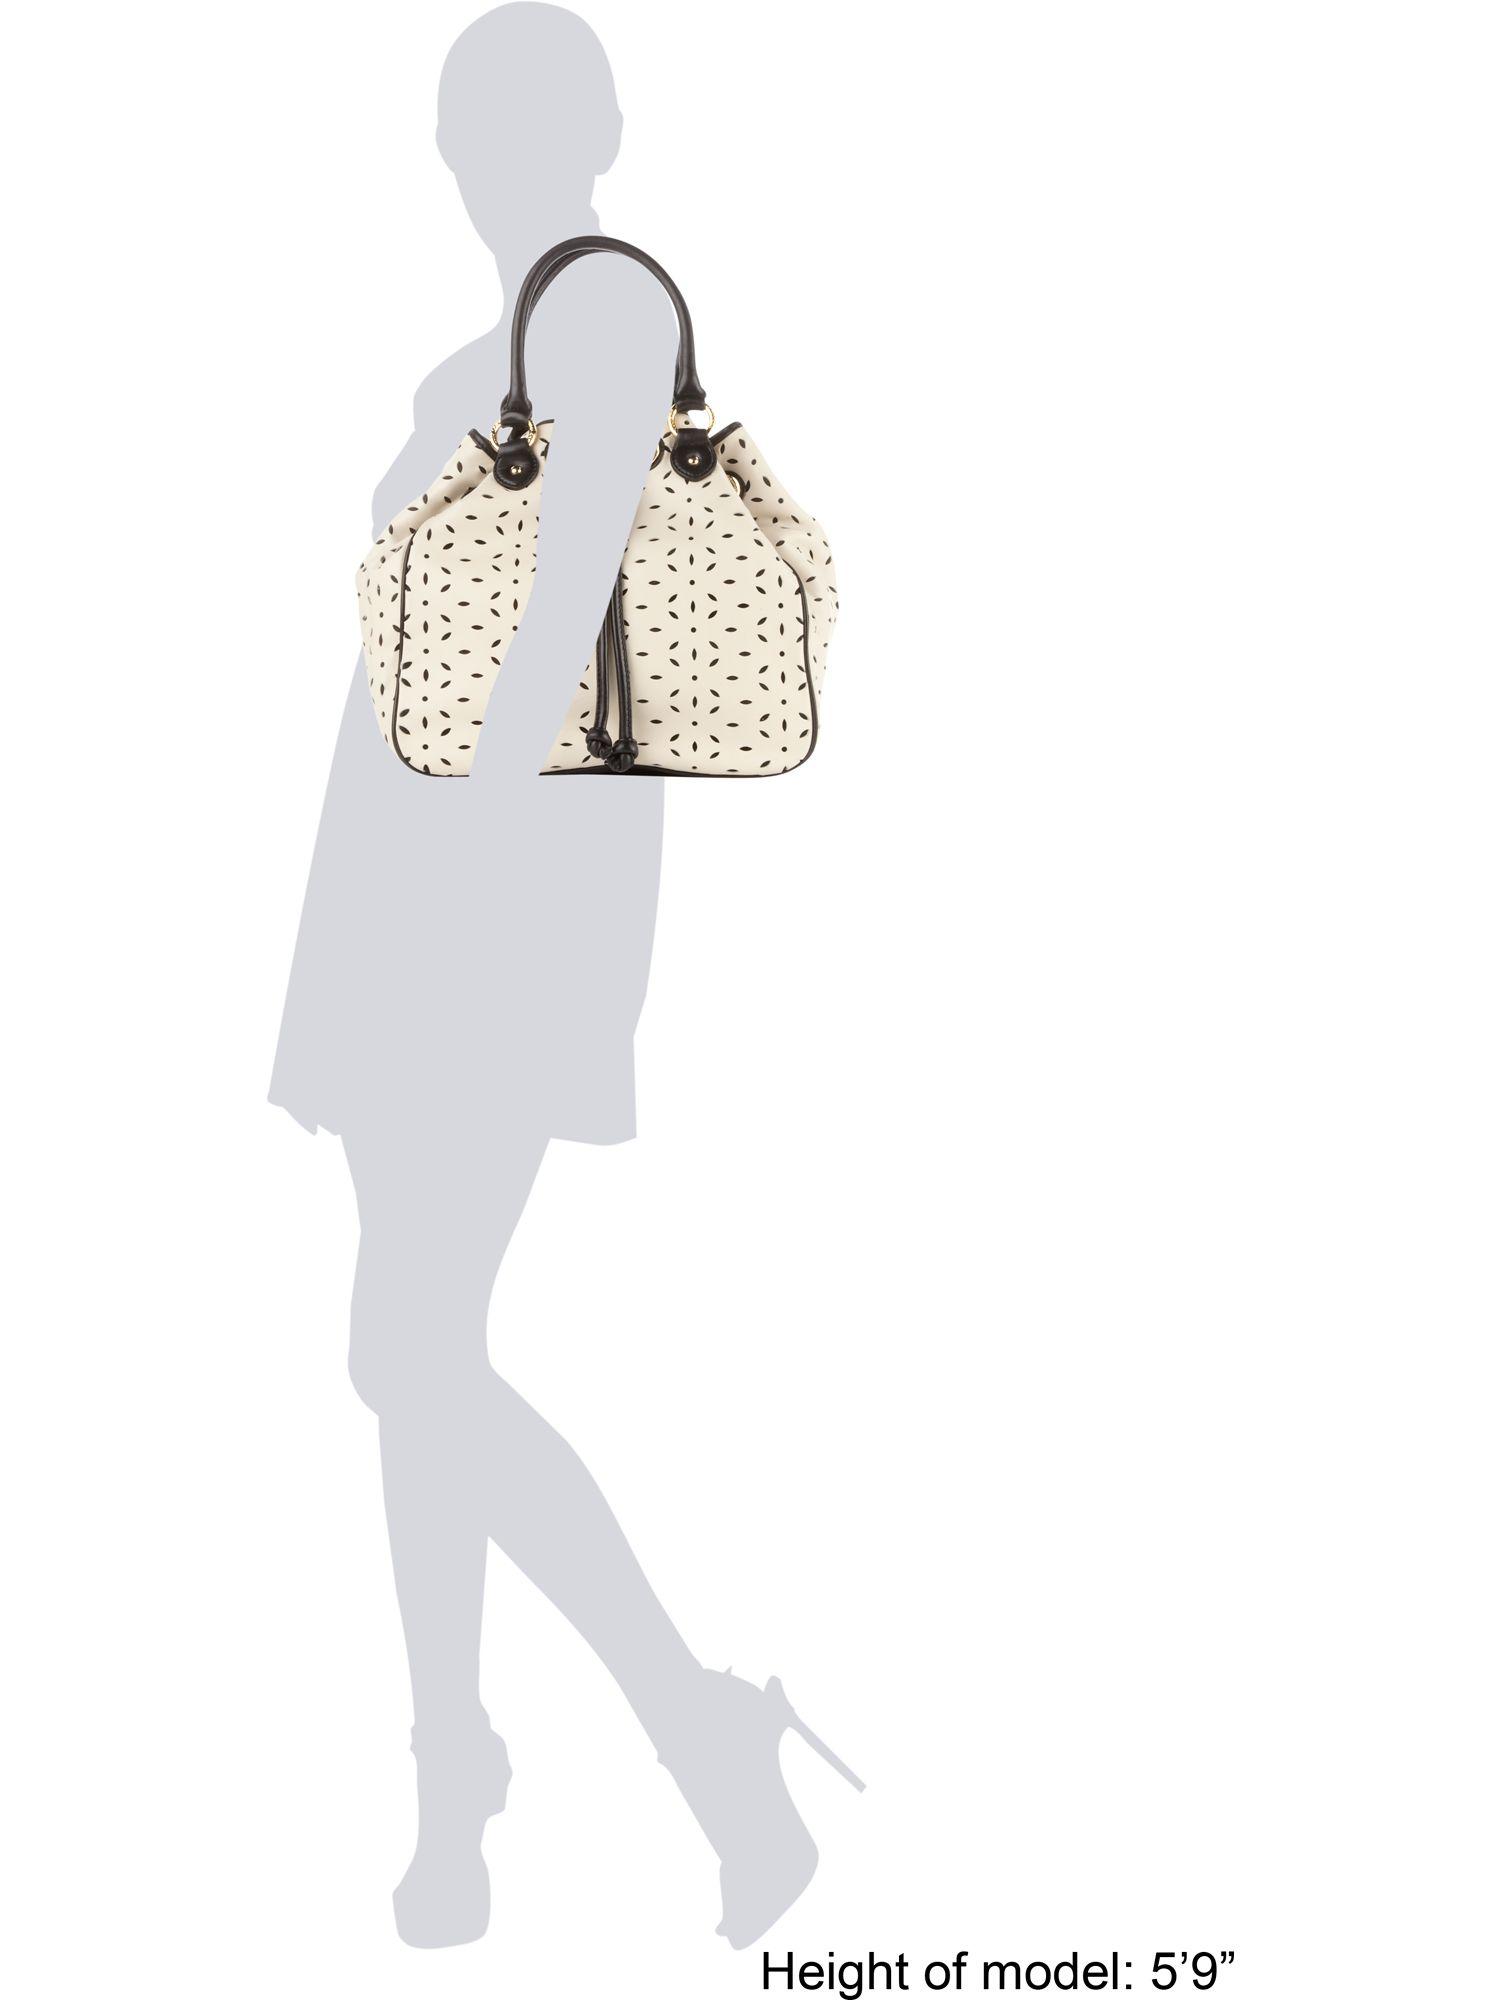 Lulu Guinness Large Jodie Drawstring Crossbody Bag in Cream (Natural)